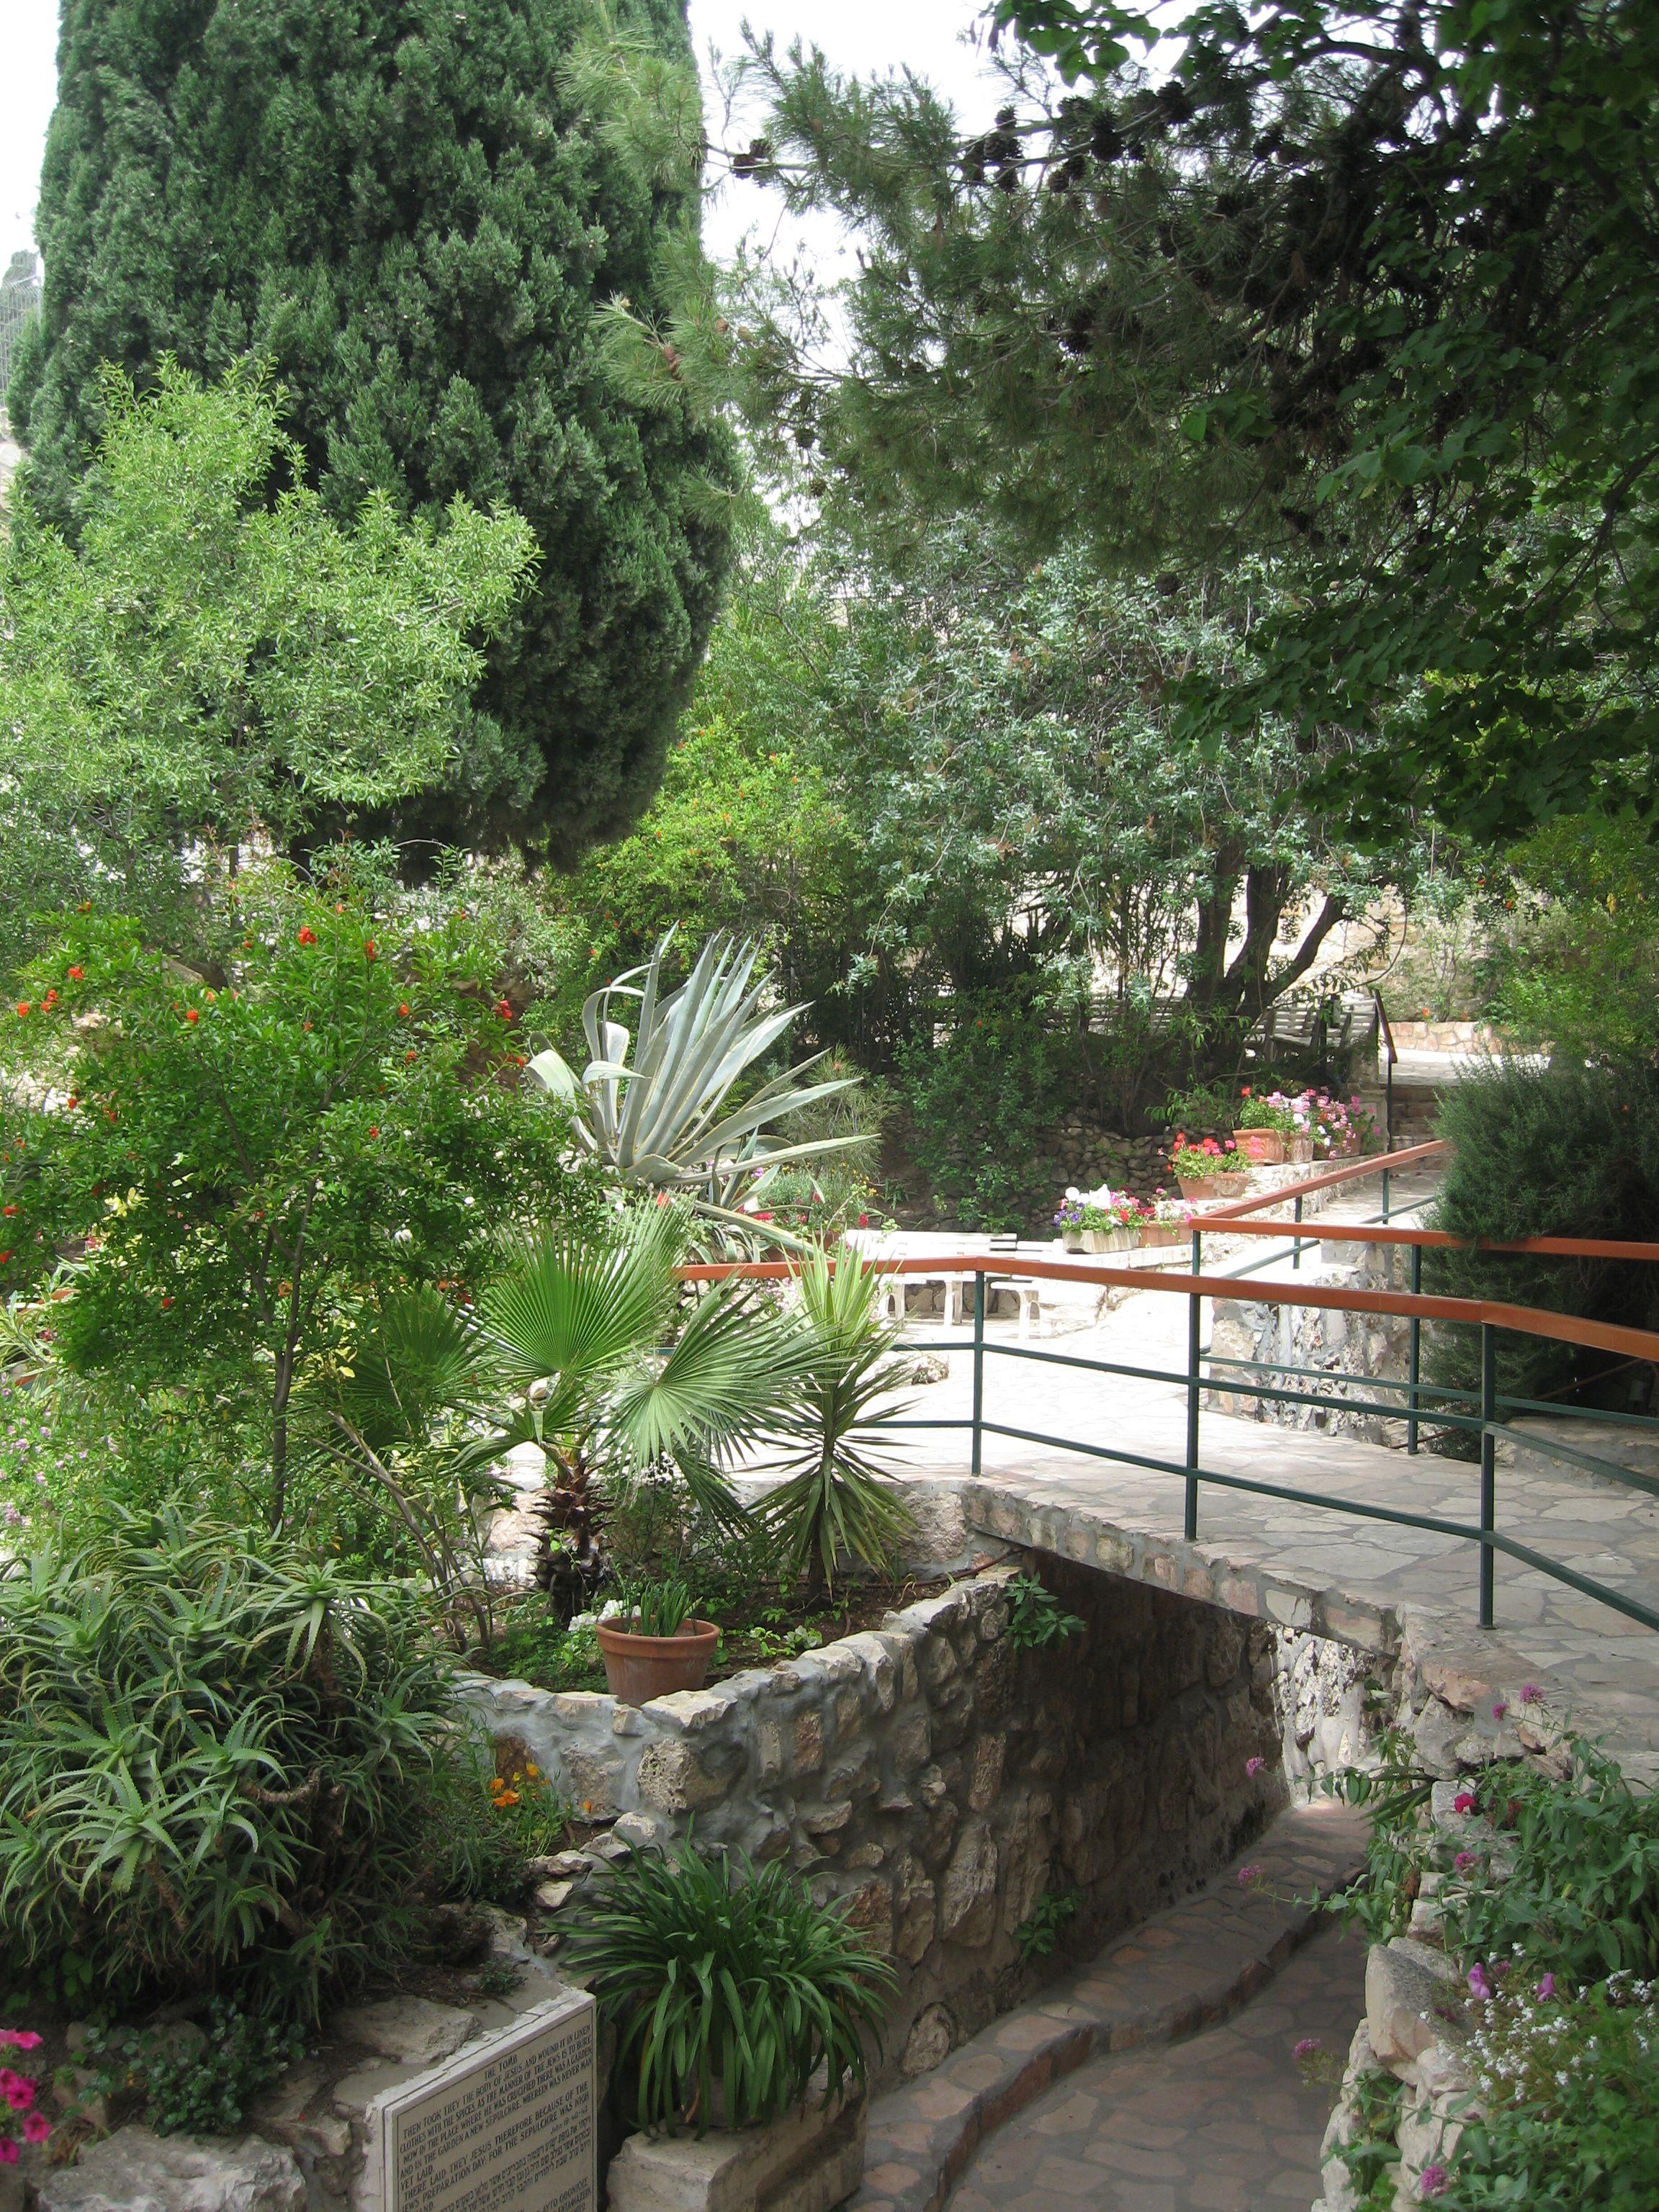 Landscape Empty Backyard : Garden of the Empty tomb of Jesus  PHOTO IMAGES  Pinterest